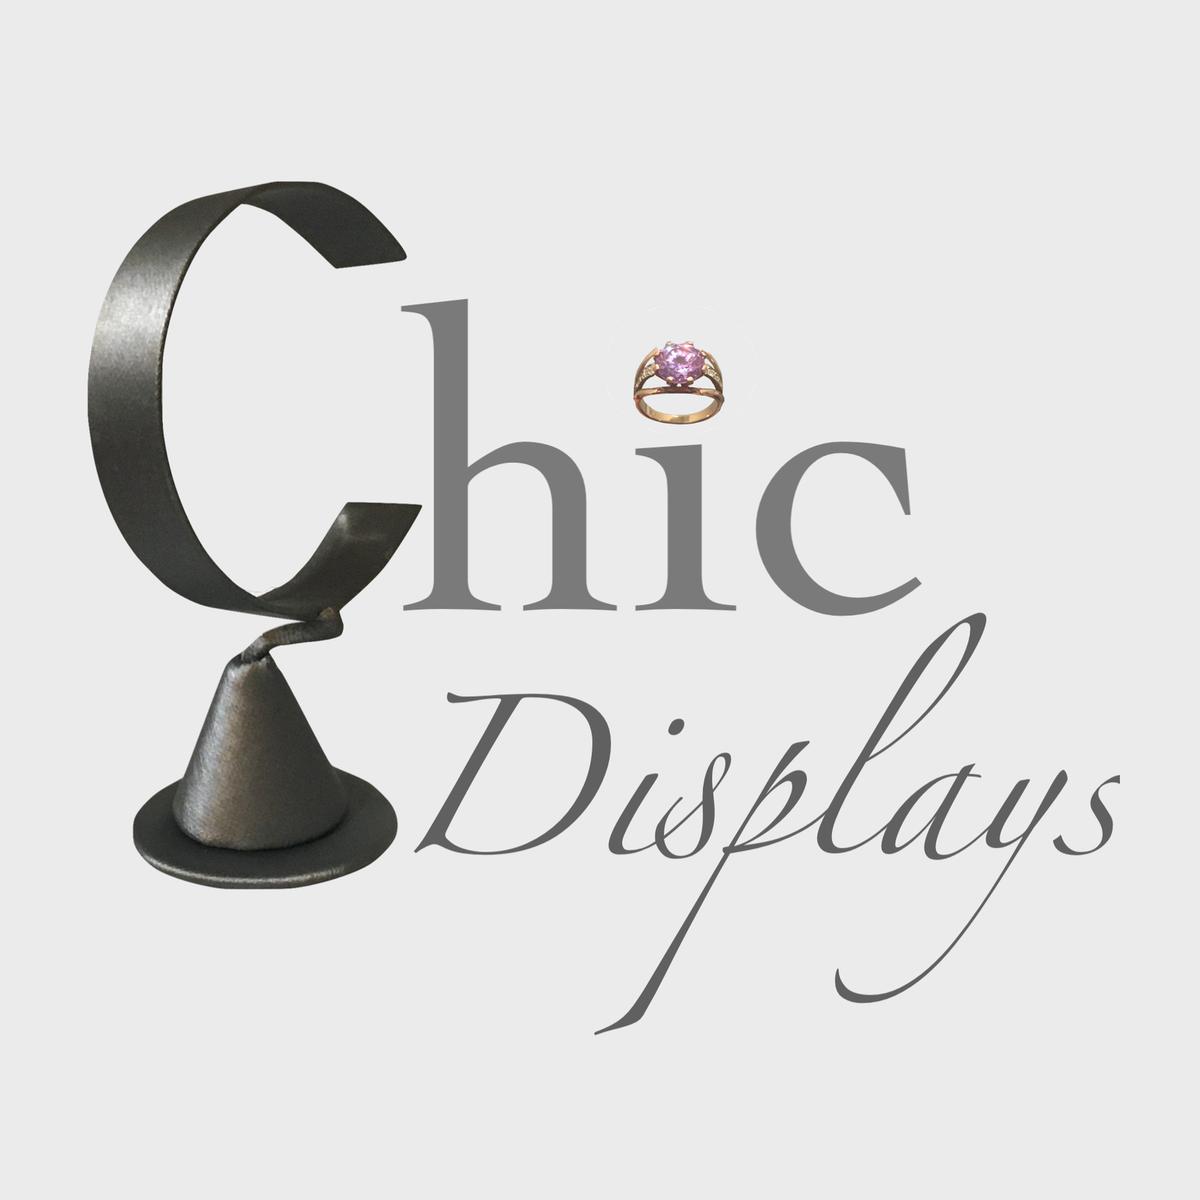 Chic Displays LLC